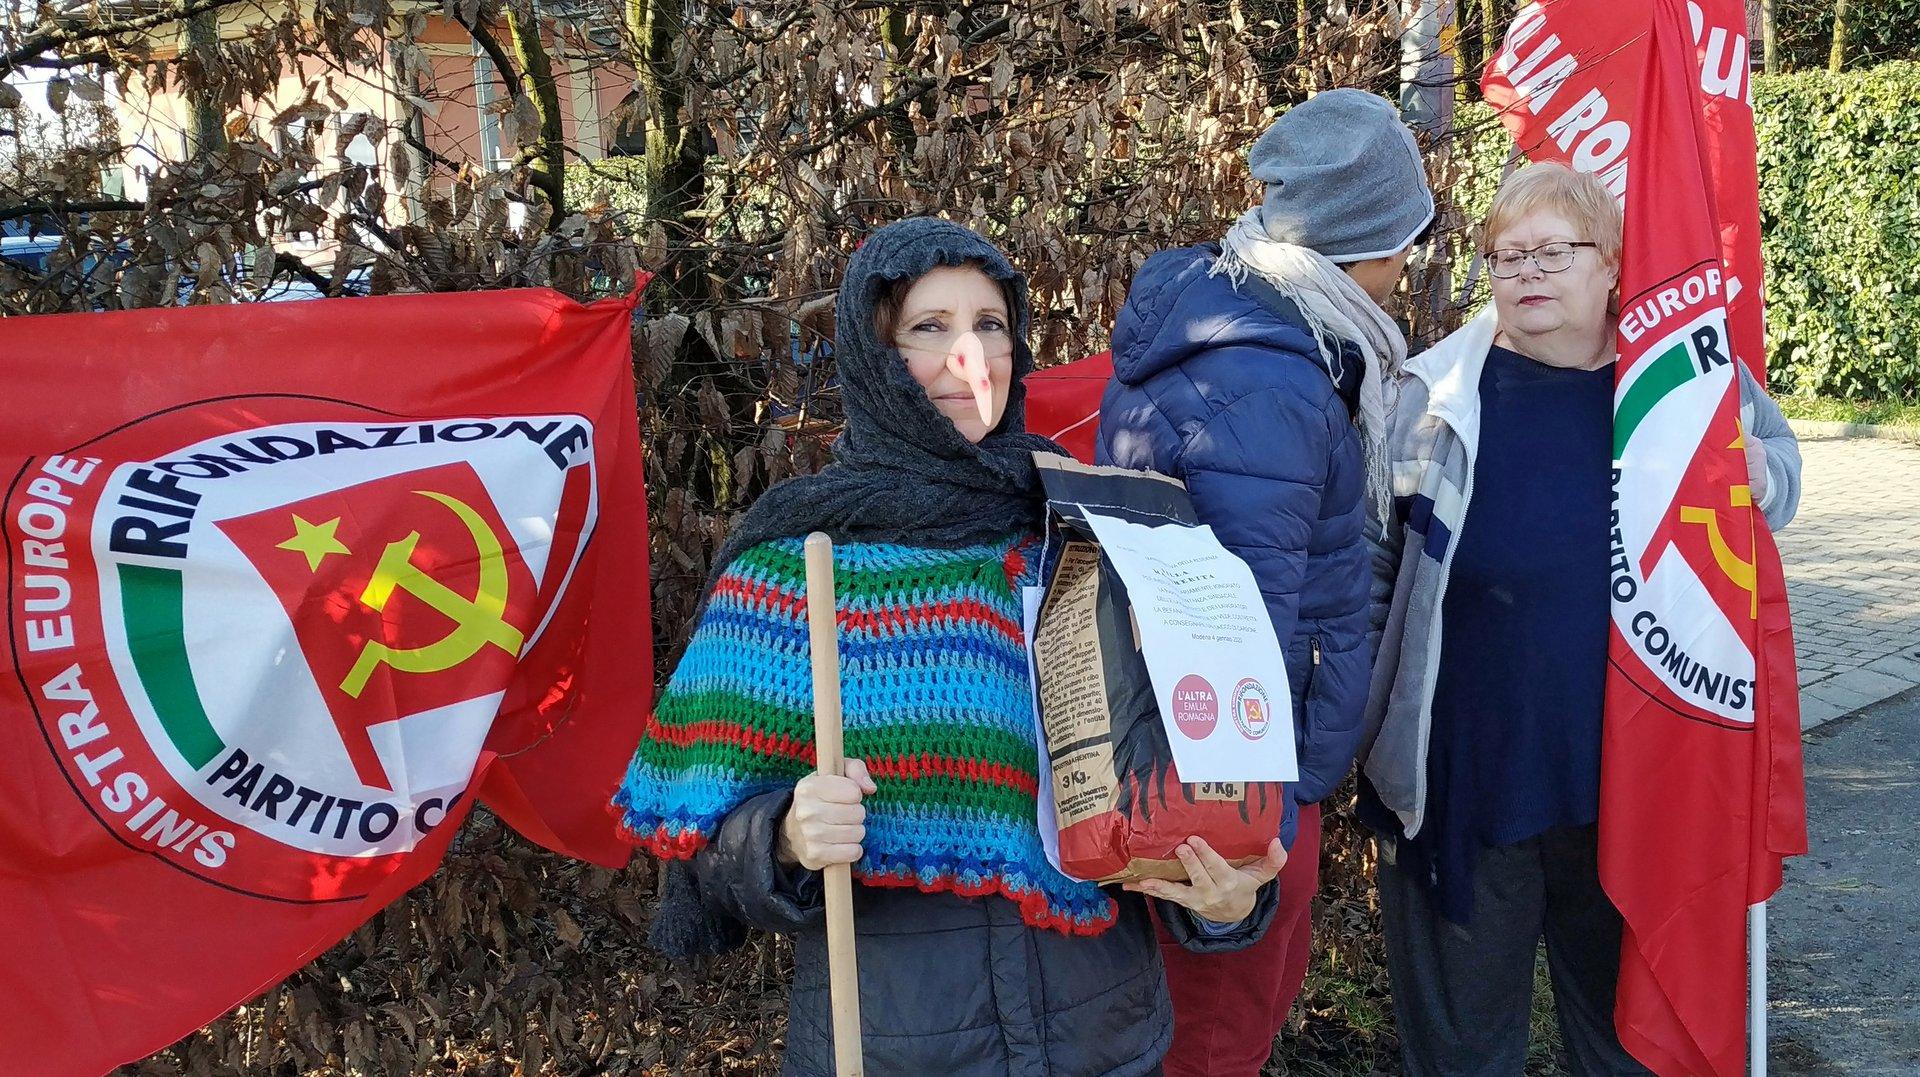 La Befana Comunista ha portato i carbone a Villa Margherita